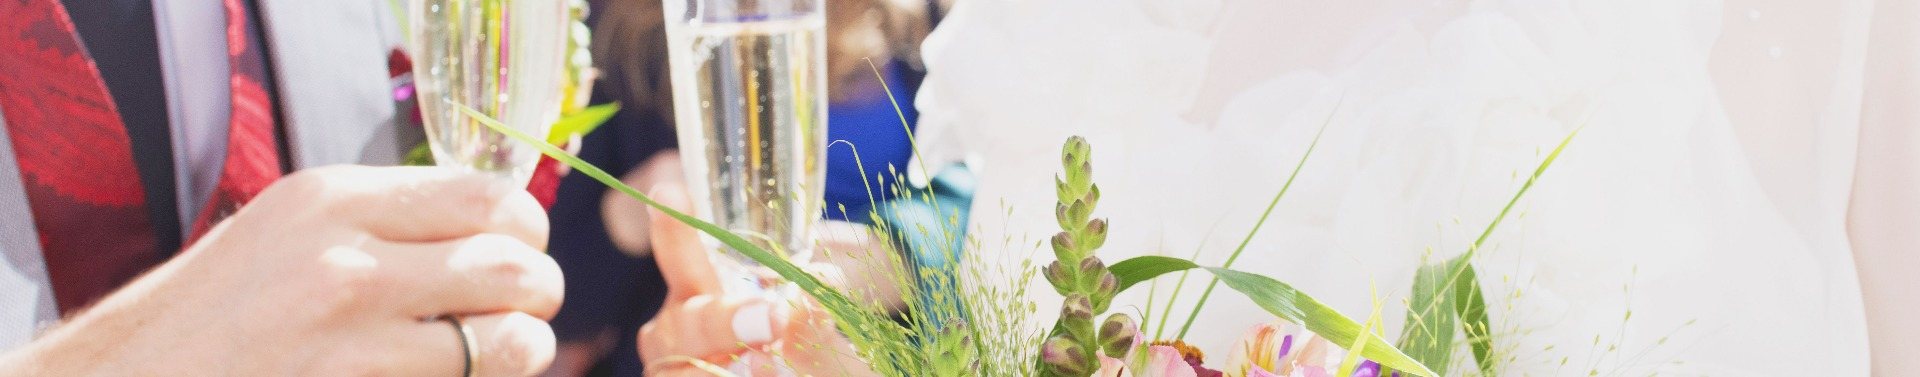 weddingadvice-bgd_1